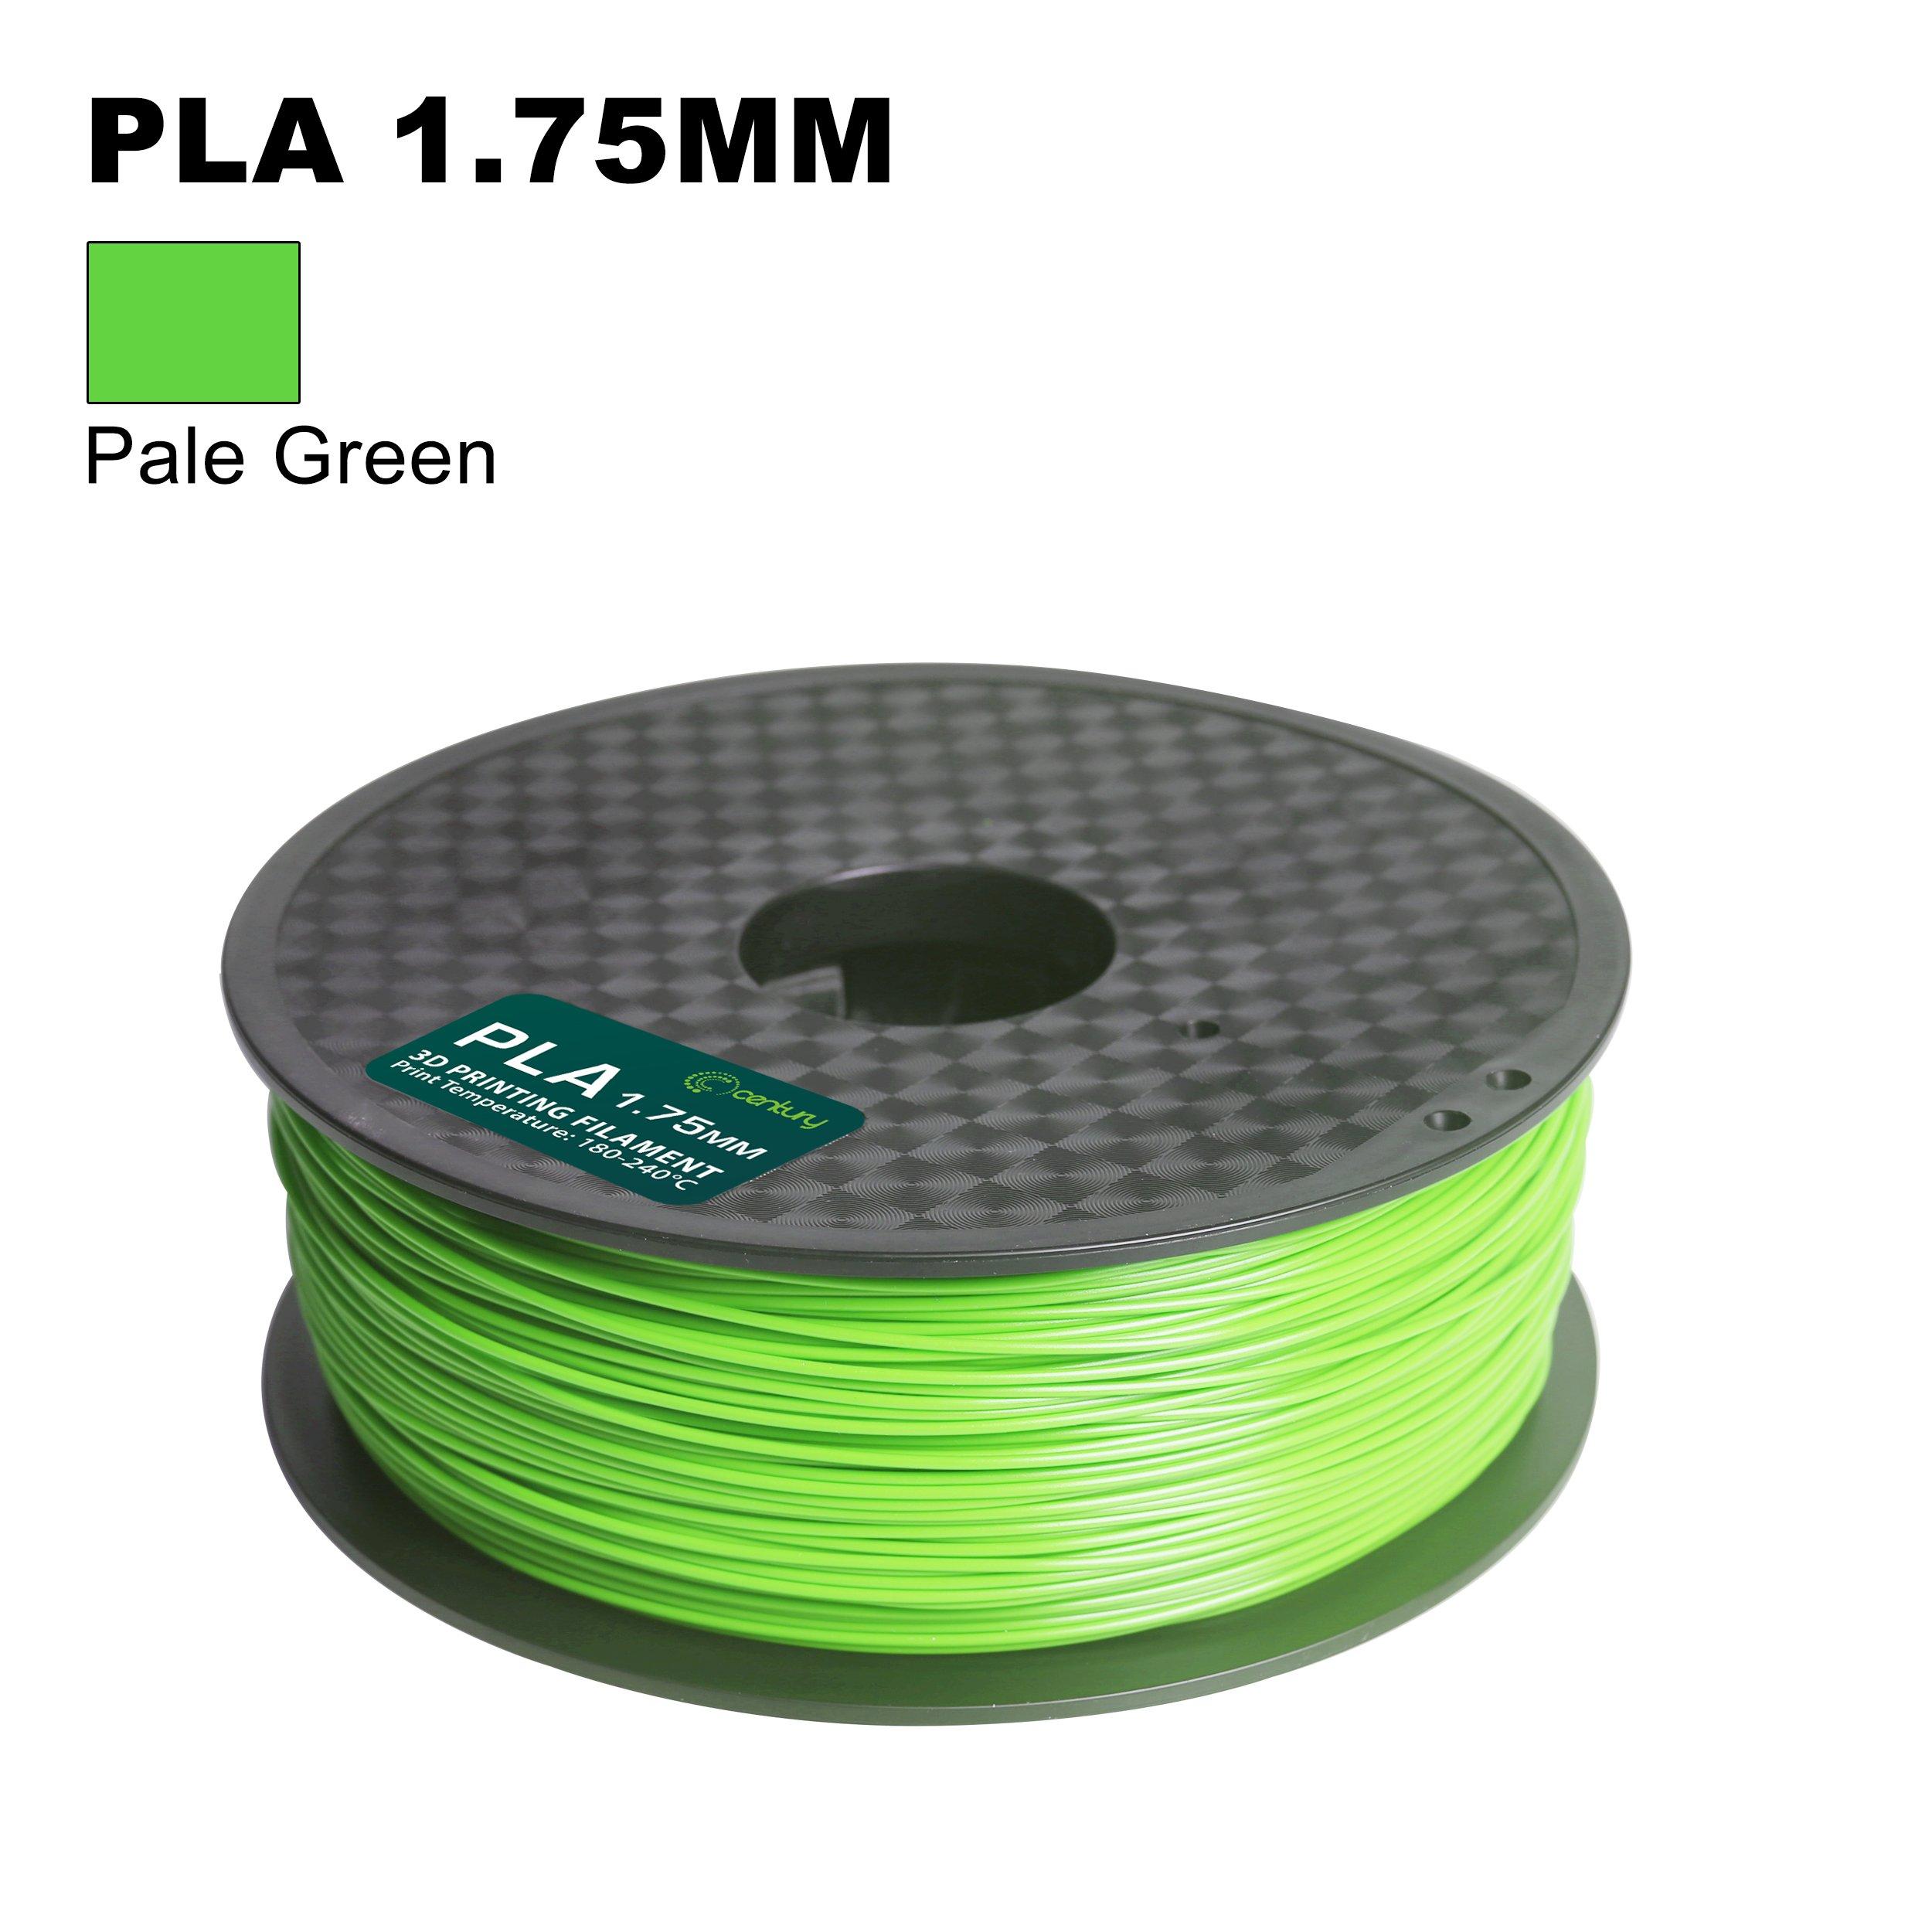 Century 3D PLA-1KG 1.75-Pale Green PLA 3D Printer Filament, Dimensional Accuracy +/- 0.05 mm, 1 kg Spool, 1.75 mm, Pale Green